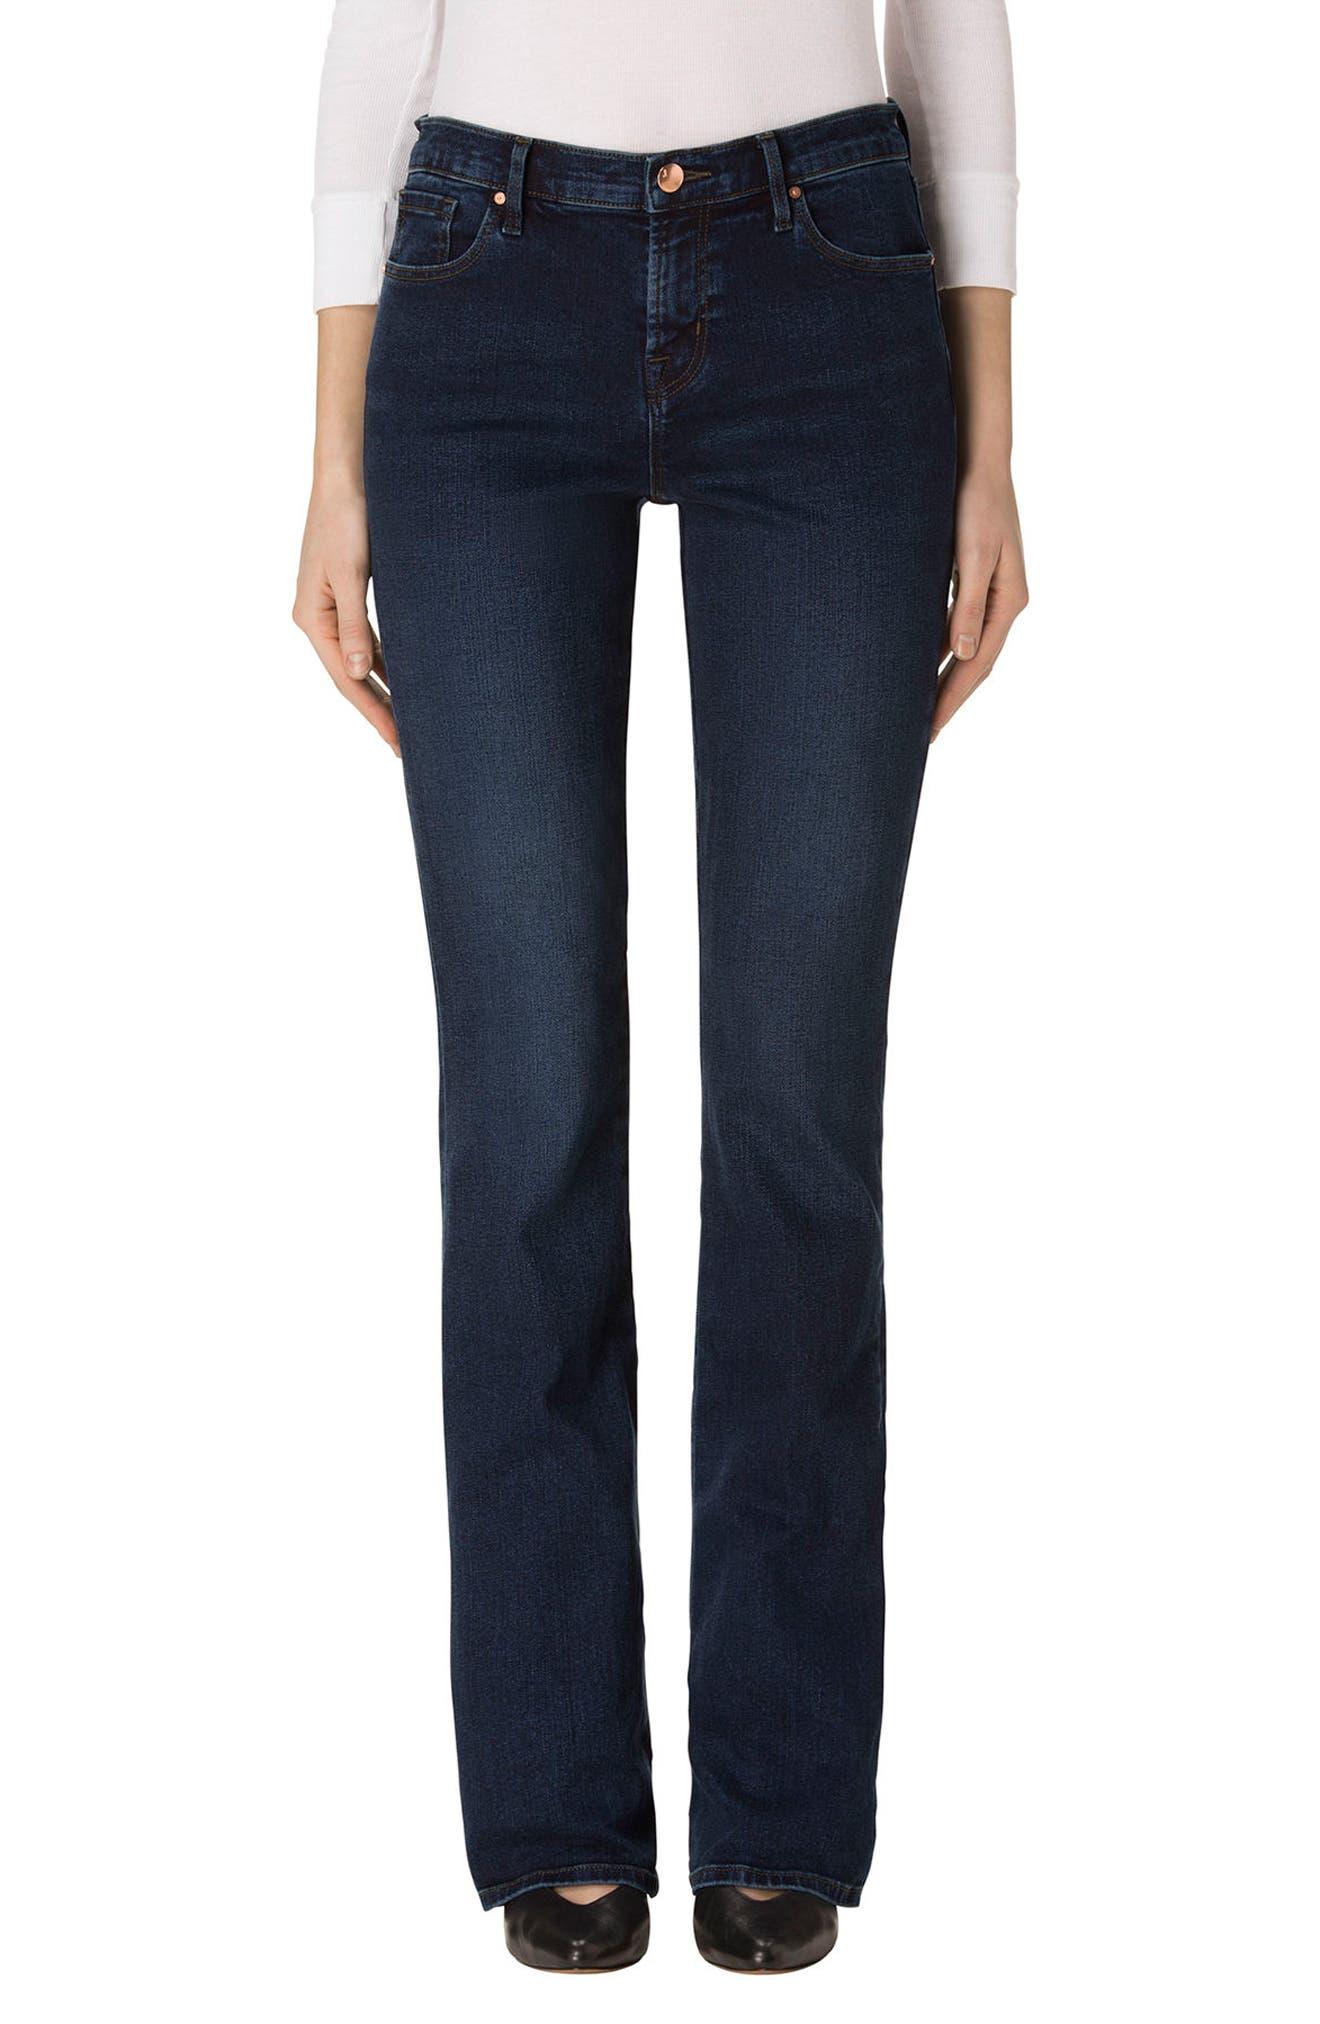 Main Image - J Brand Litah Bootcut Jeans